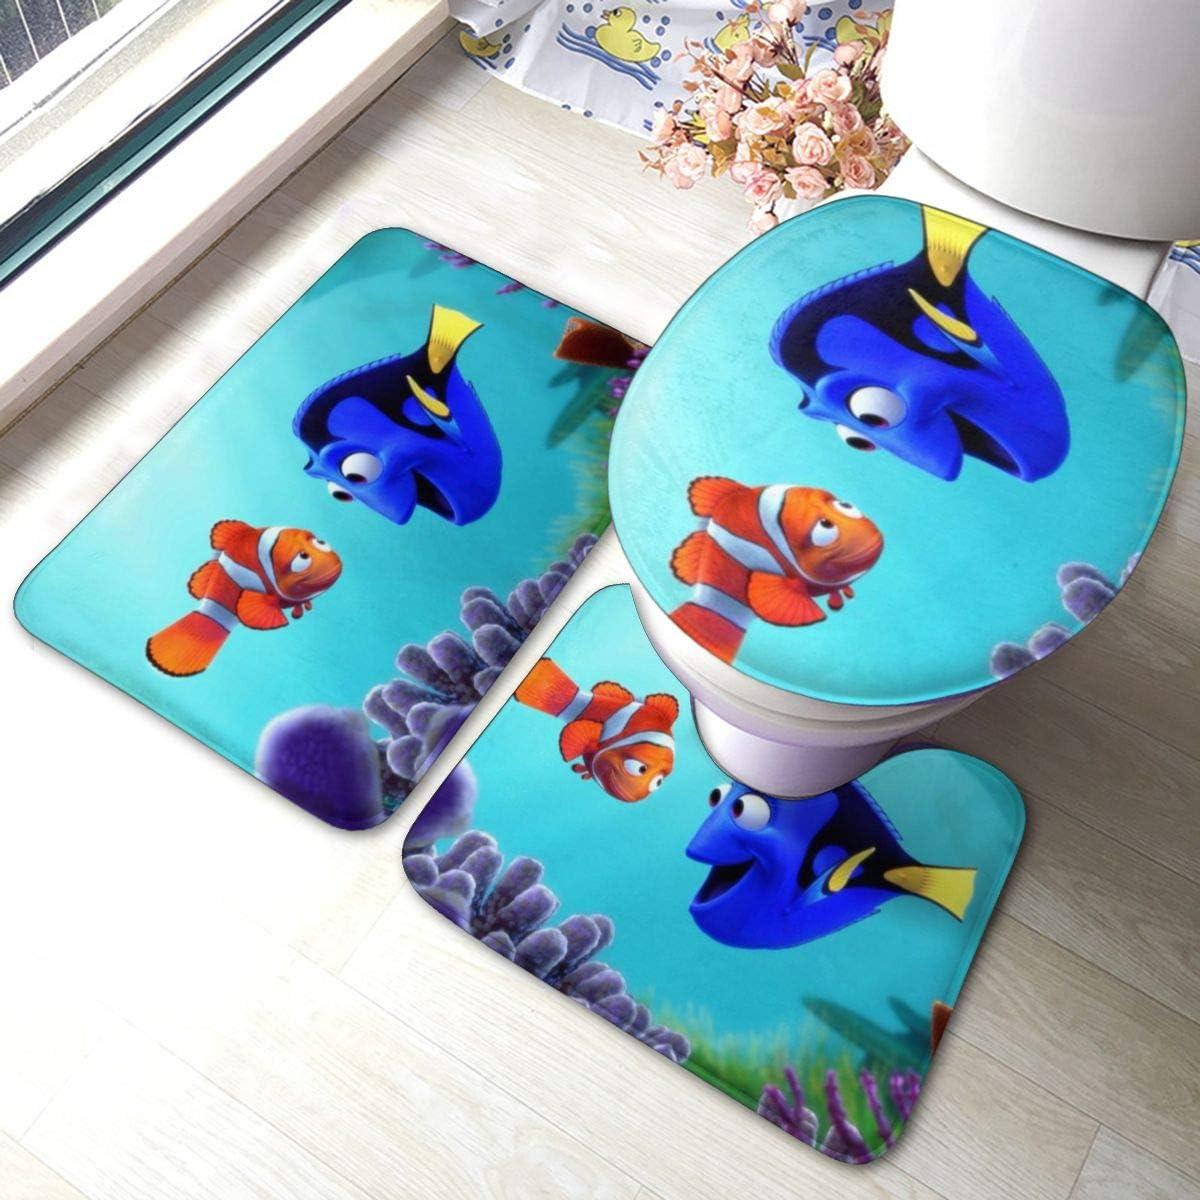 Finding Ne-mo Colorful Non Slip Bathroom Rug Set 3 Piece Anti-Skid Bath Mat 15.7 Inches X 23.6 Inches Type U Contour Rug Toilet Lid Cover Mat